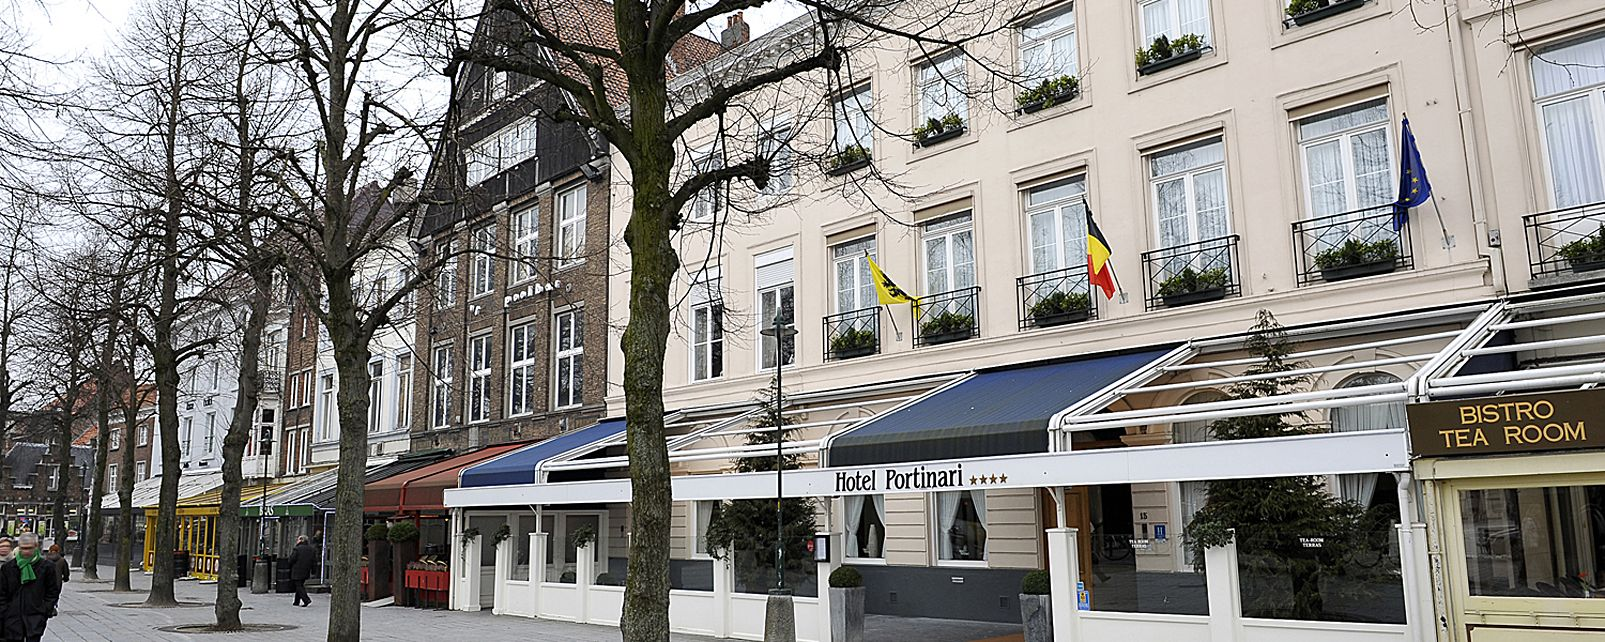 Hôtel Portinari